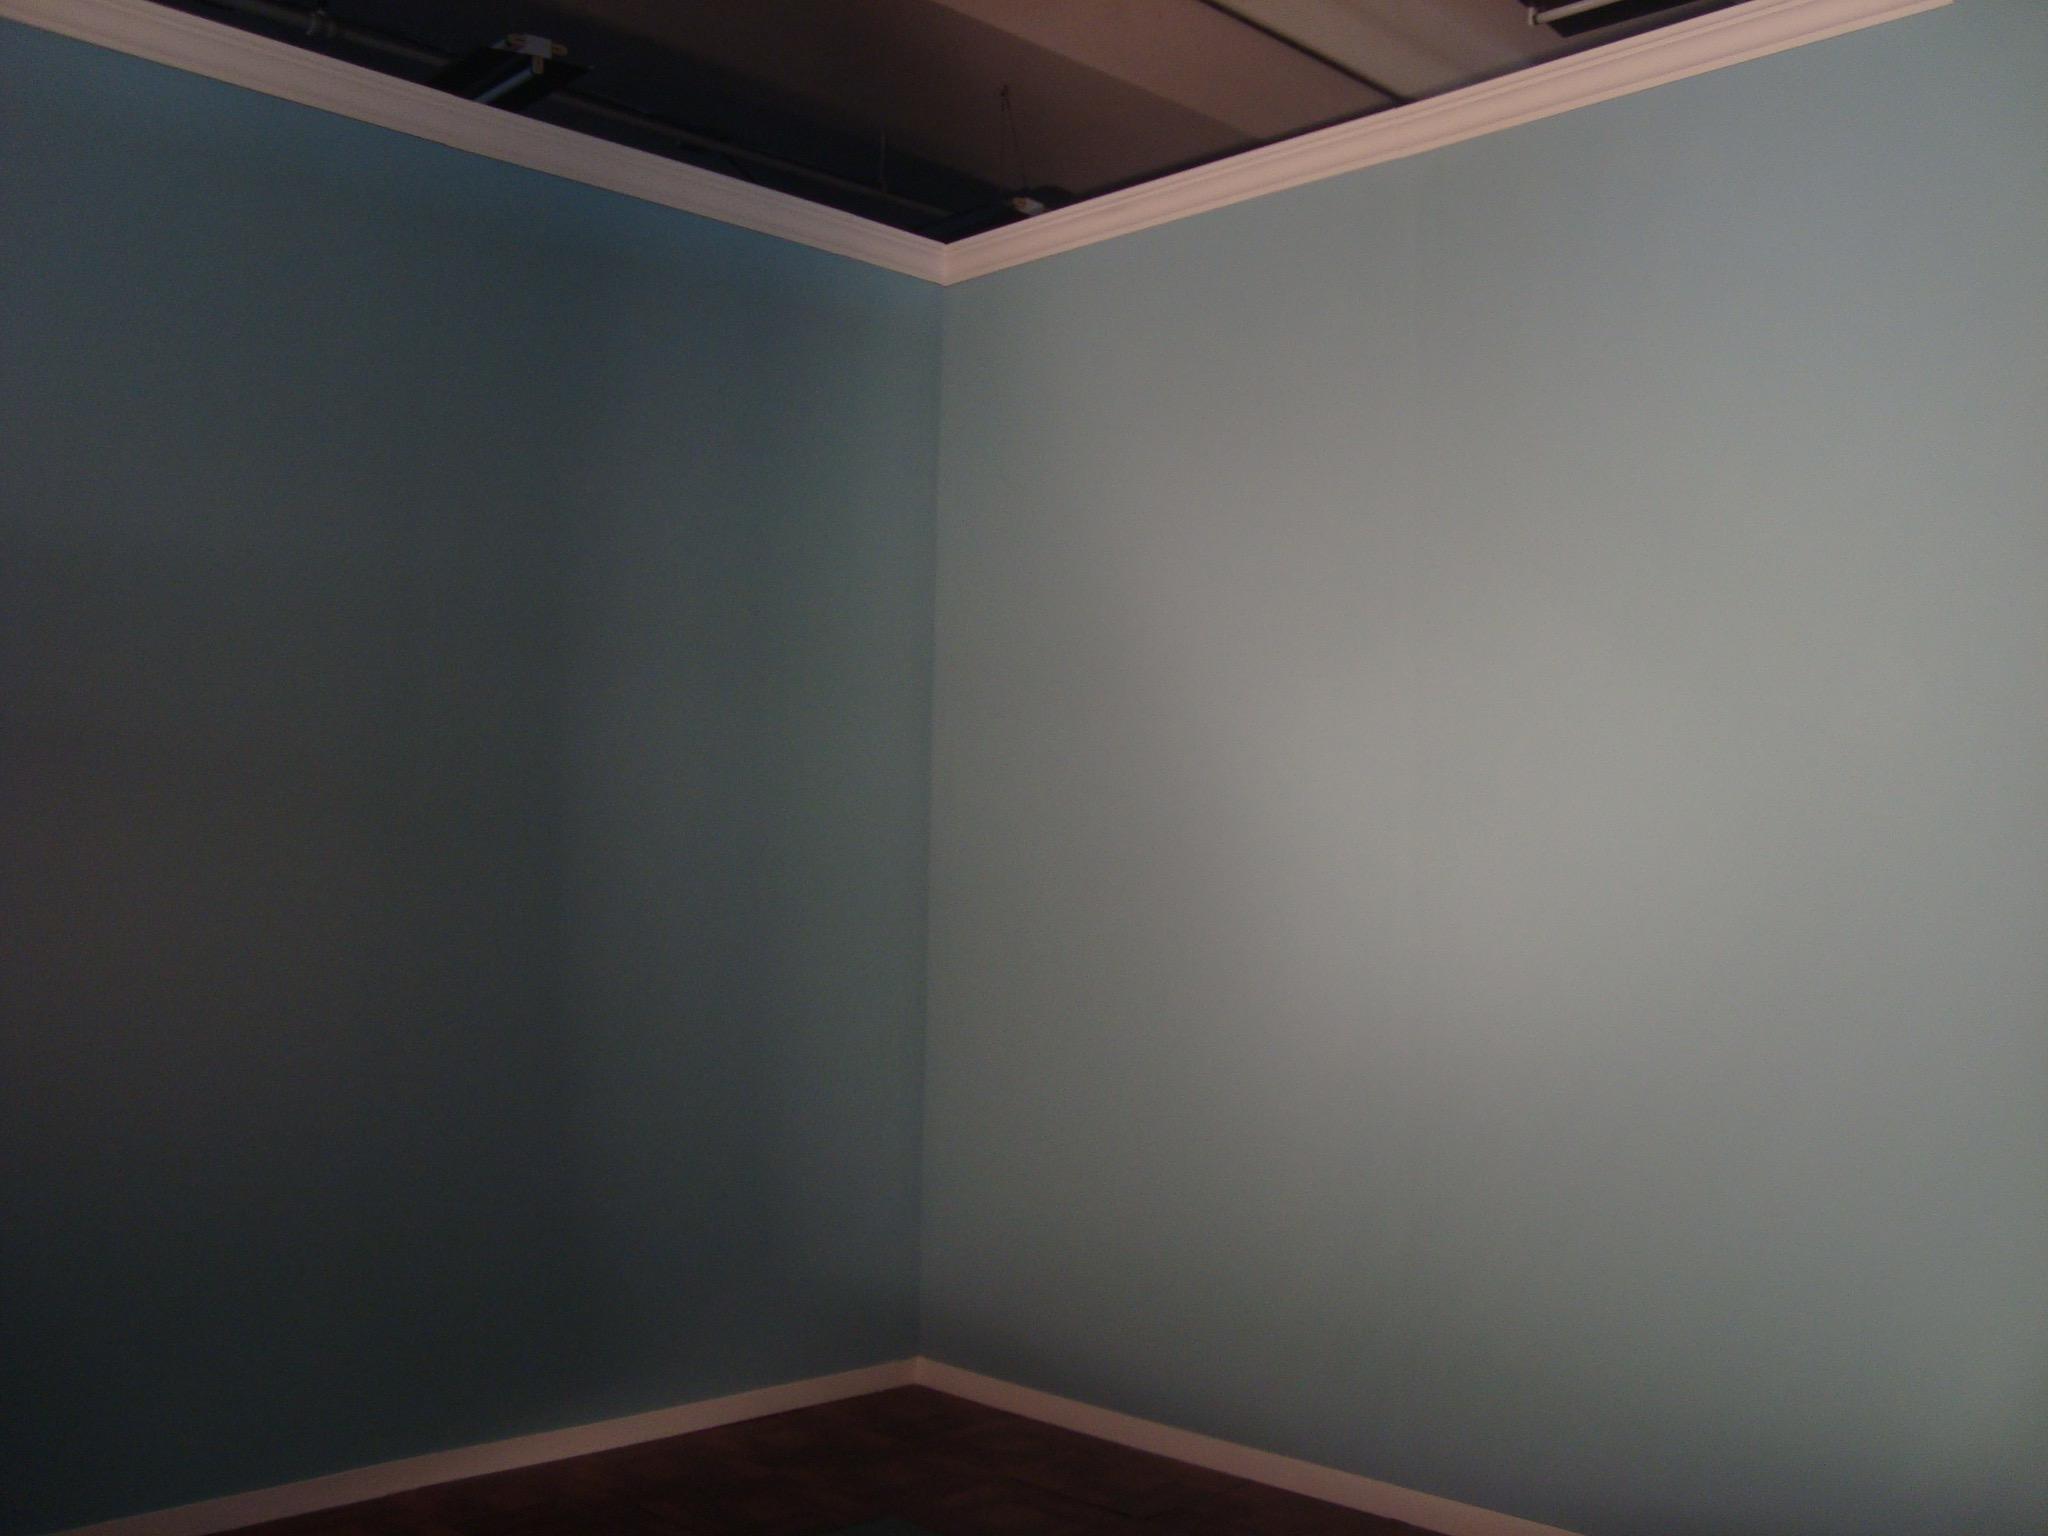 Untitled (Blue Room), 2011